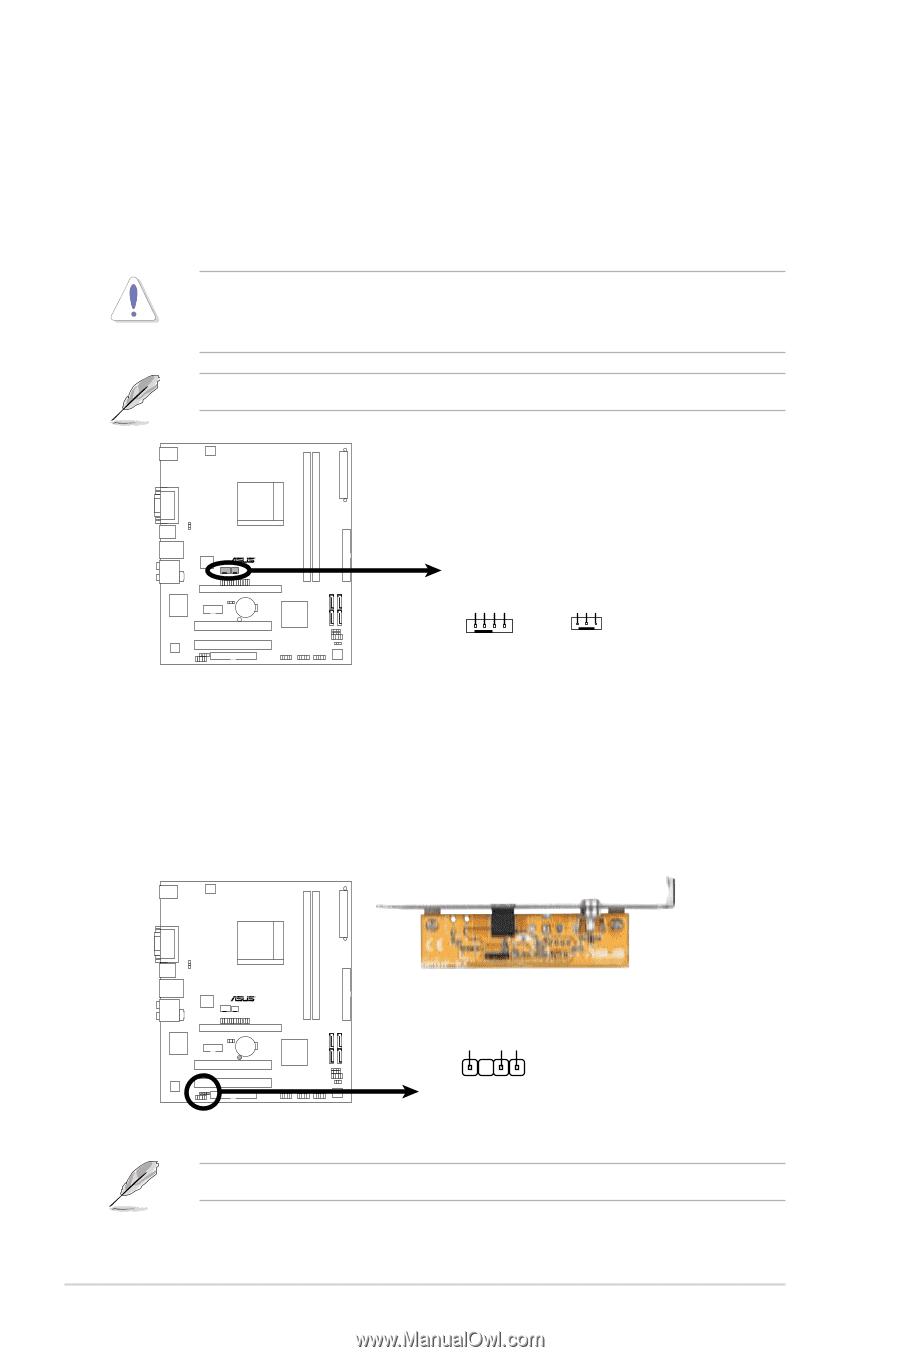 M2N CM DVI ETHERNET WINDOWS 8 X64 DRIVER